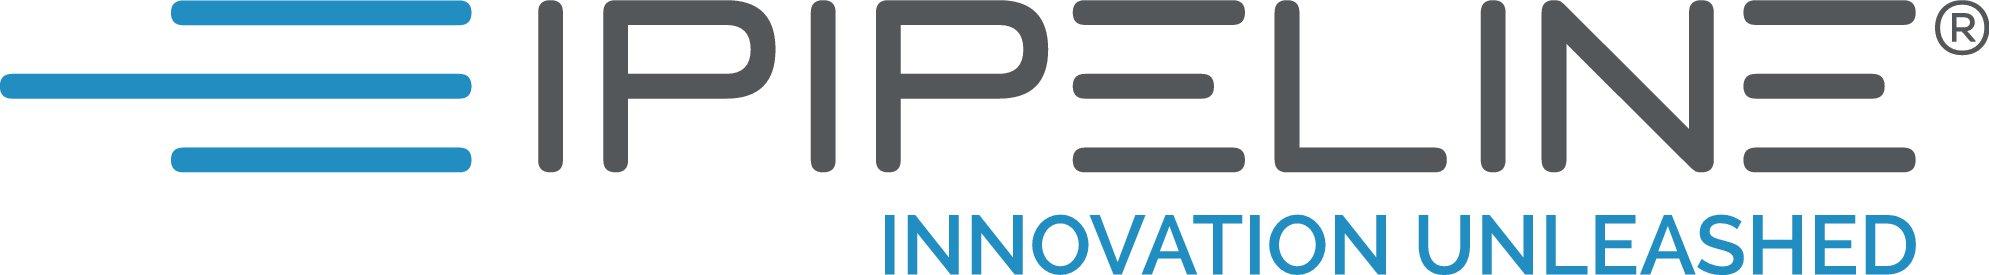 iPipeline_Logo_FullColor.png